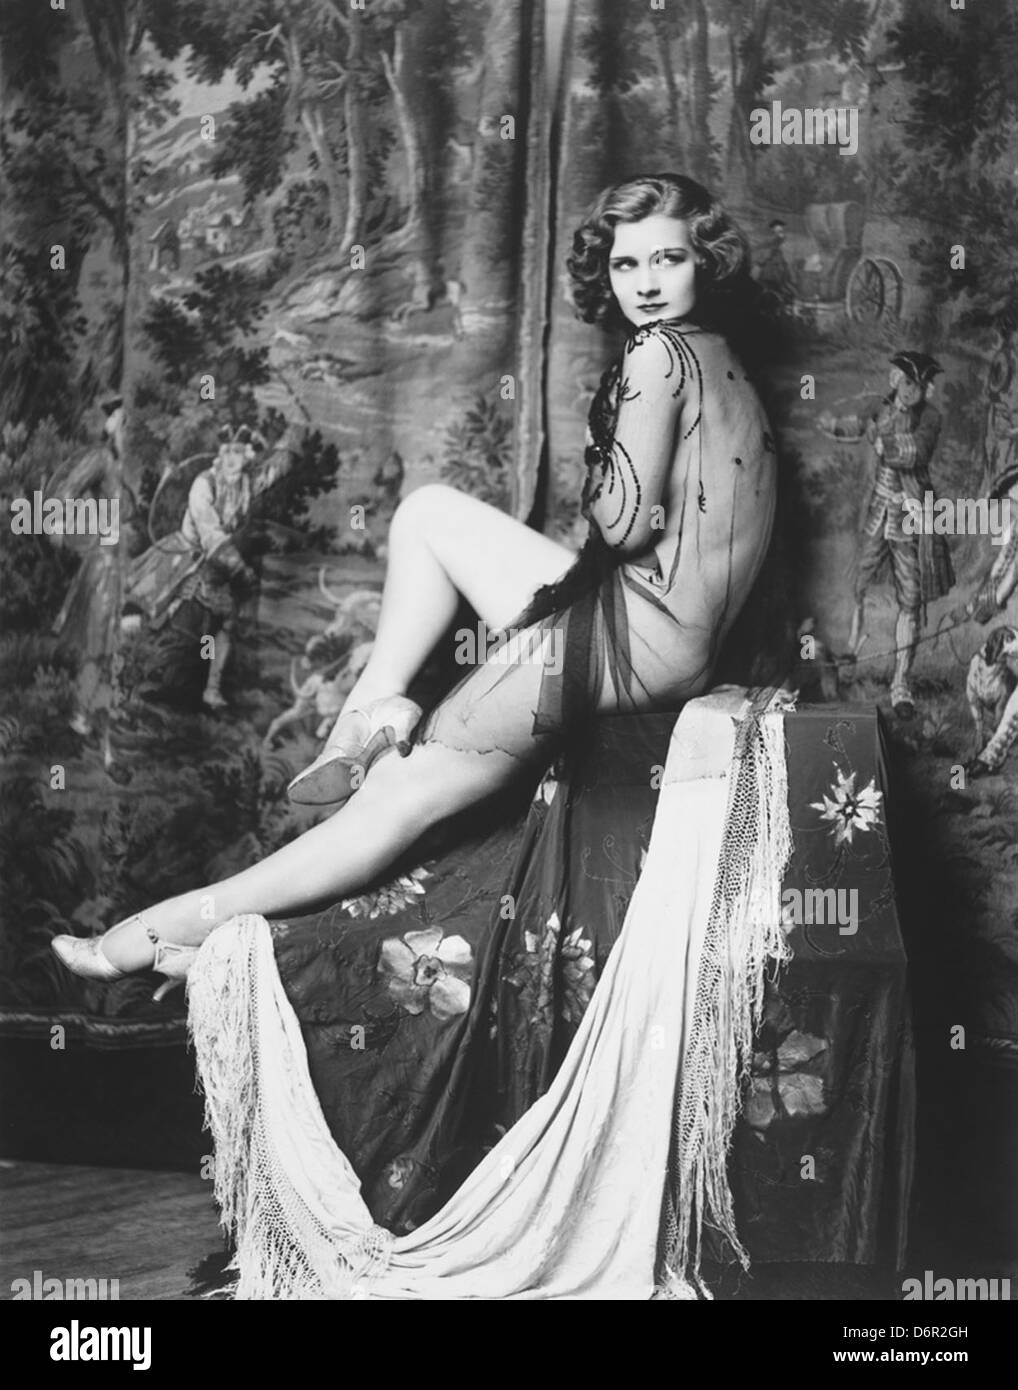 Ziegfeld girl Drucilla Strain by Alfred Cheney Johnston, ca. 1928 - Stock Image